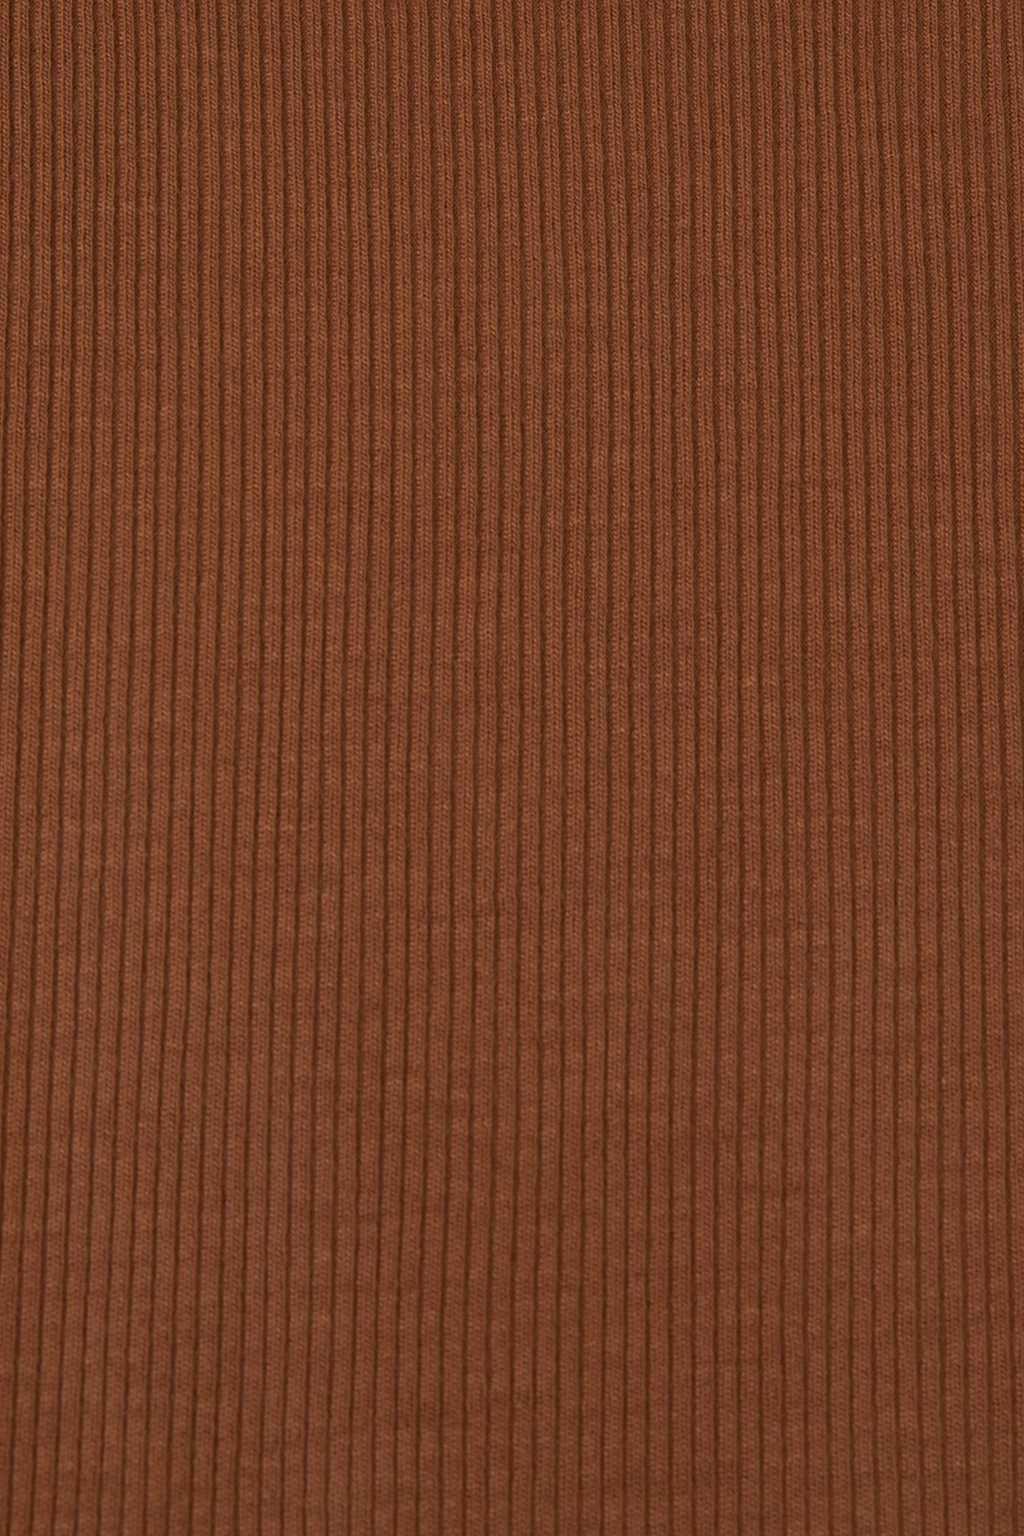 TShirt H429 Brown 8